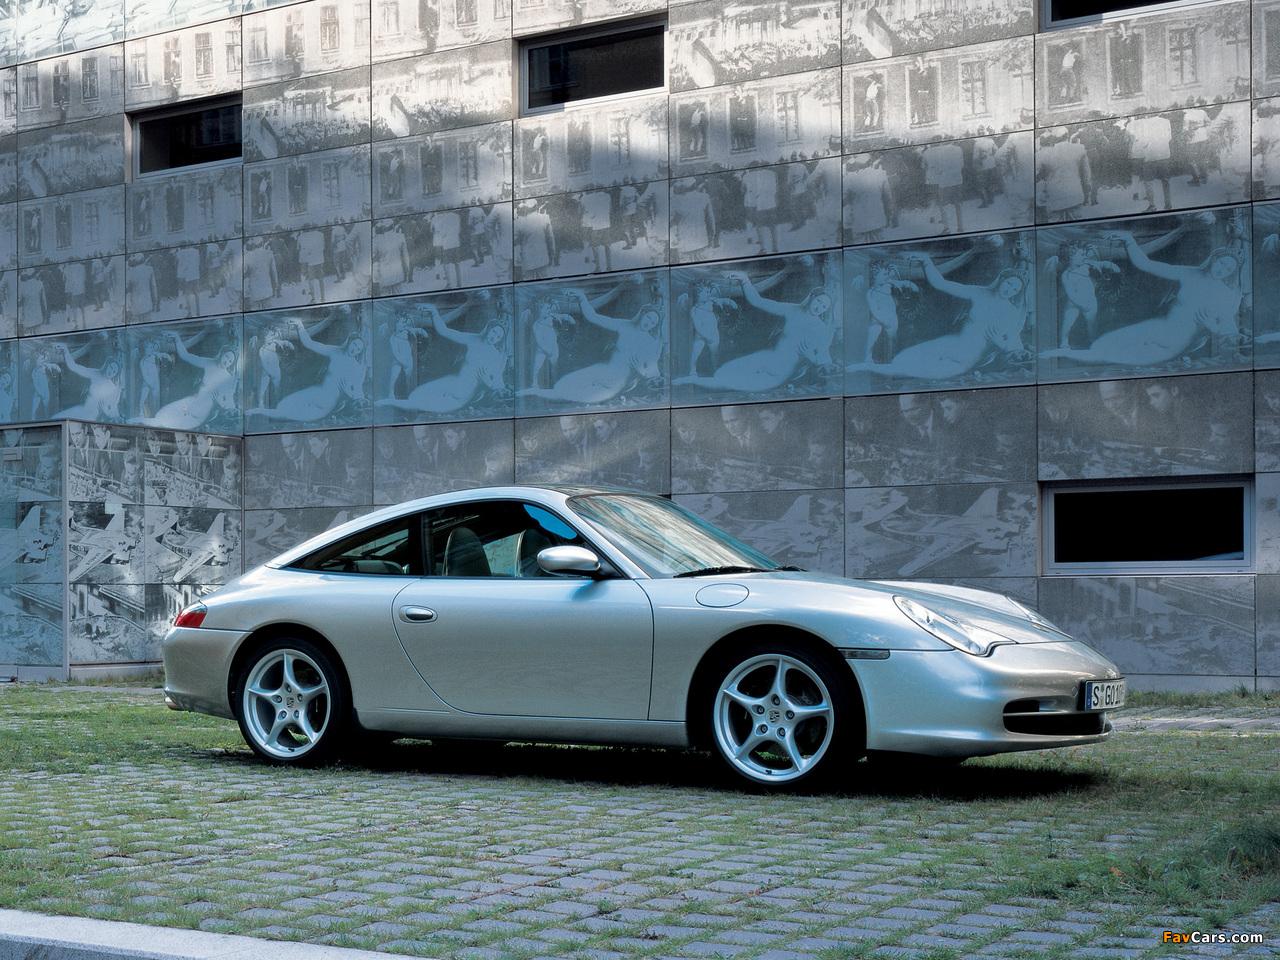 Images Of Porsche 911 Targa 996 2001 05 1280x960